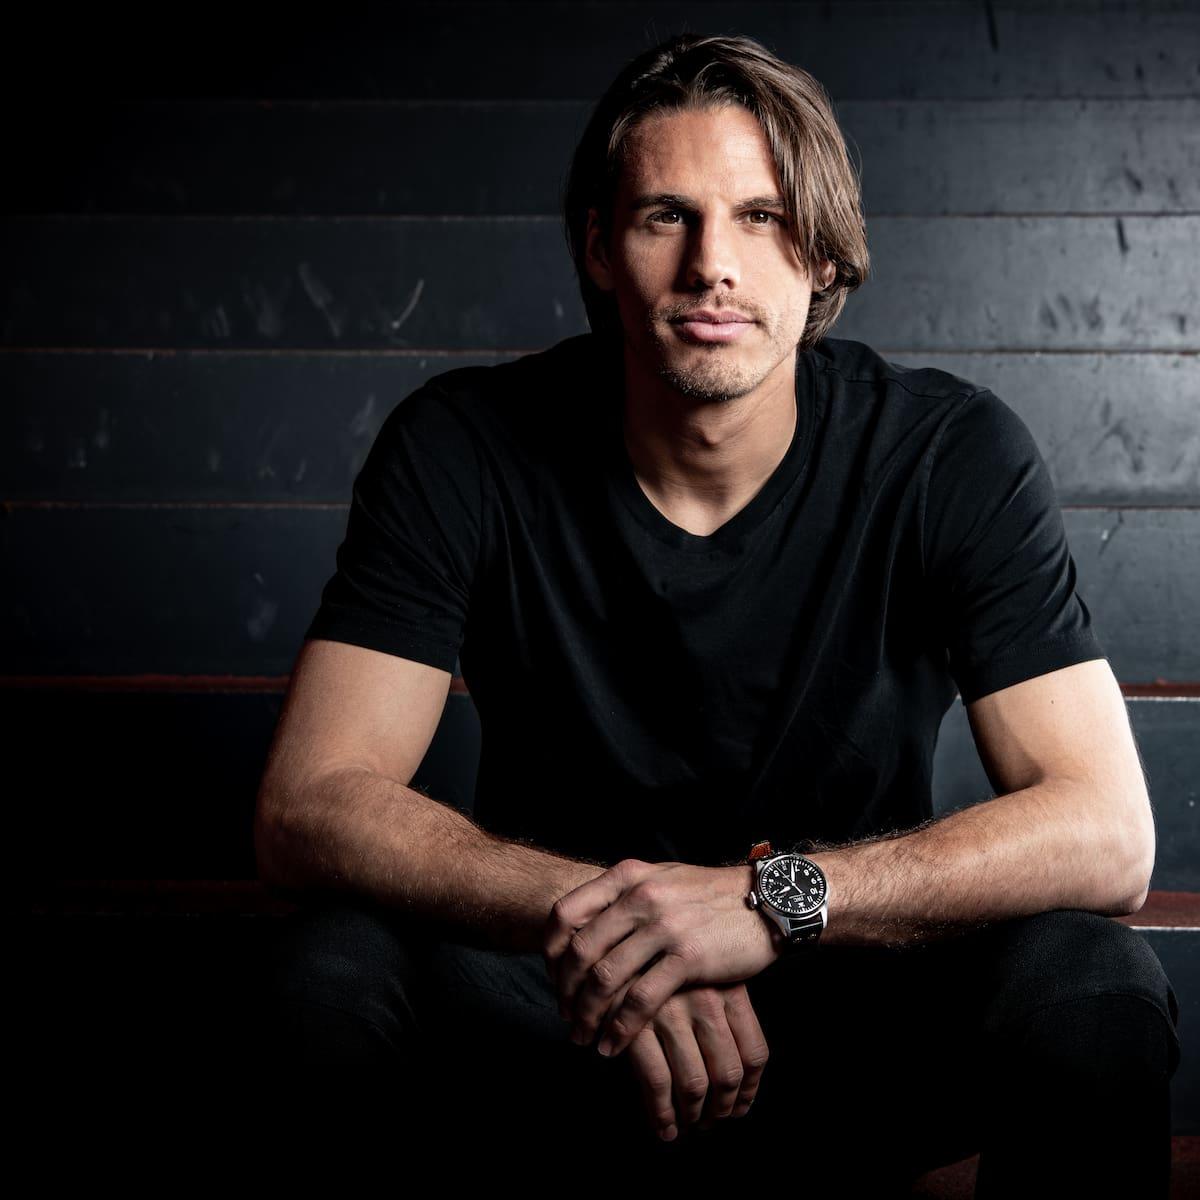 Nati Goalie Yann Sommer Wird 30 Das Grosse Interview Blick